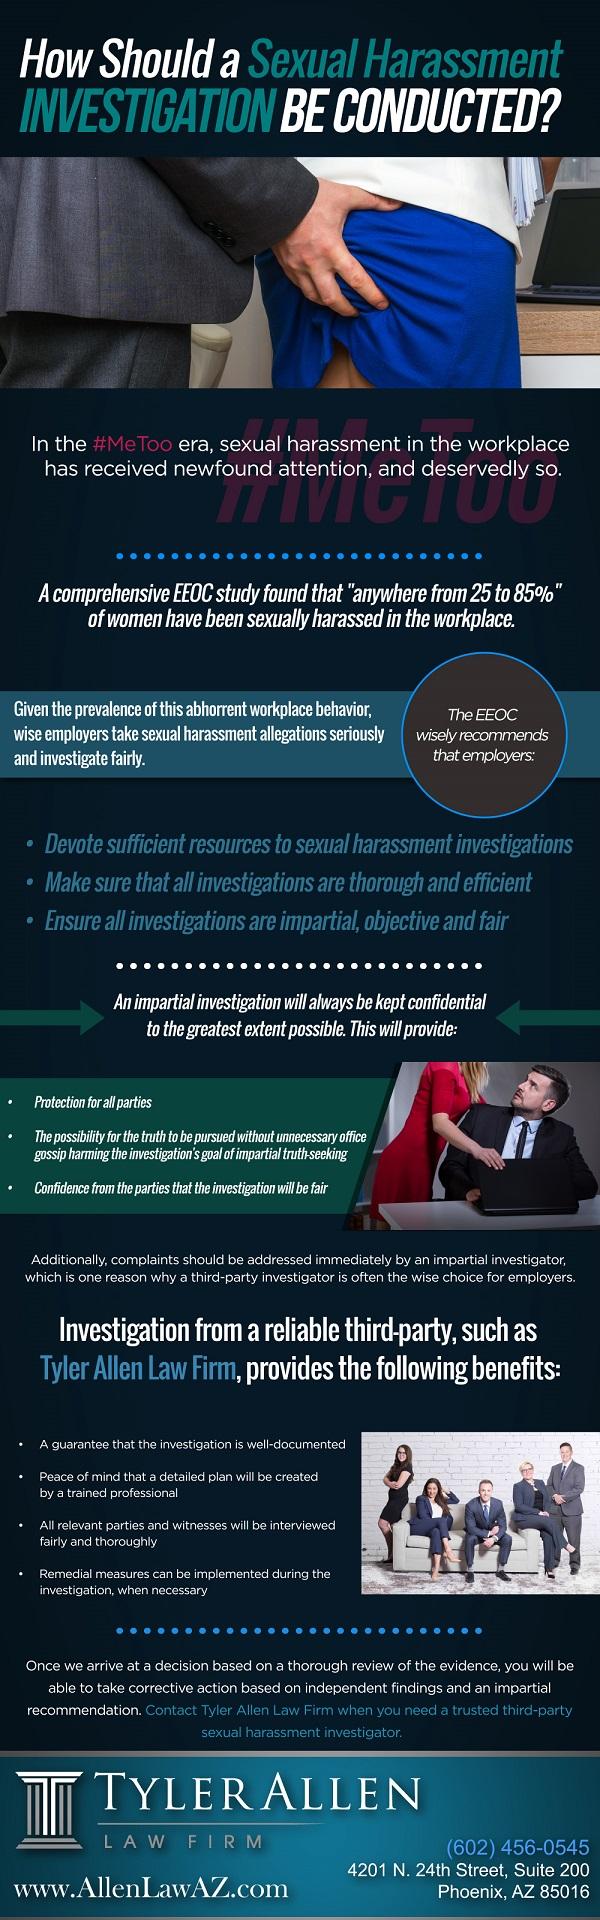 Sexual-Harassment-Investigation.jpg